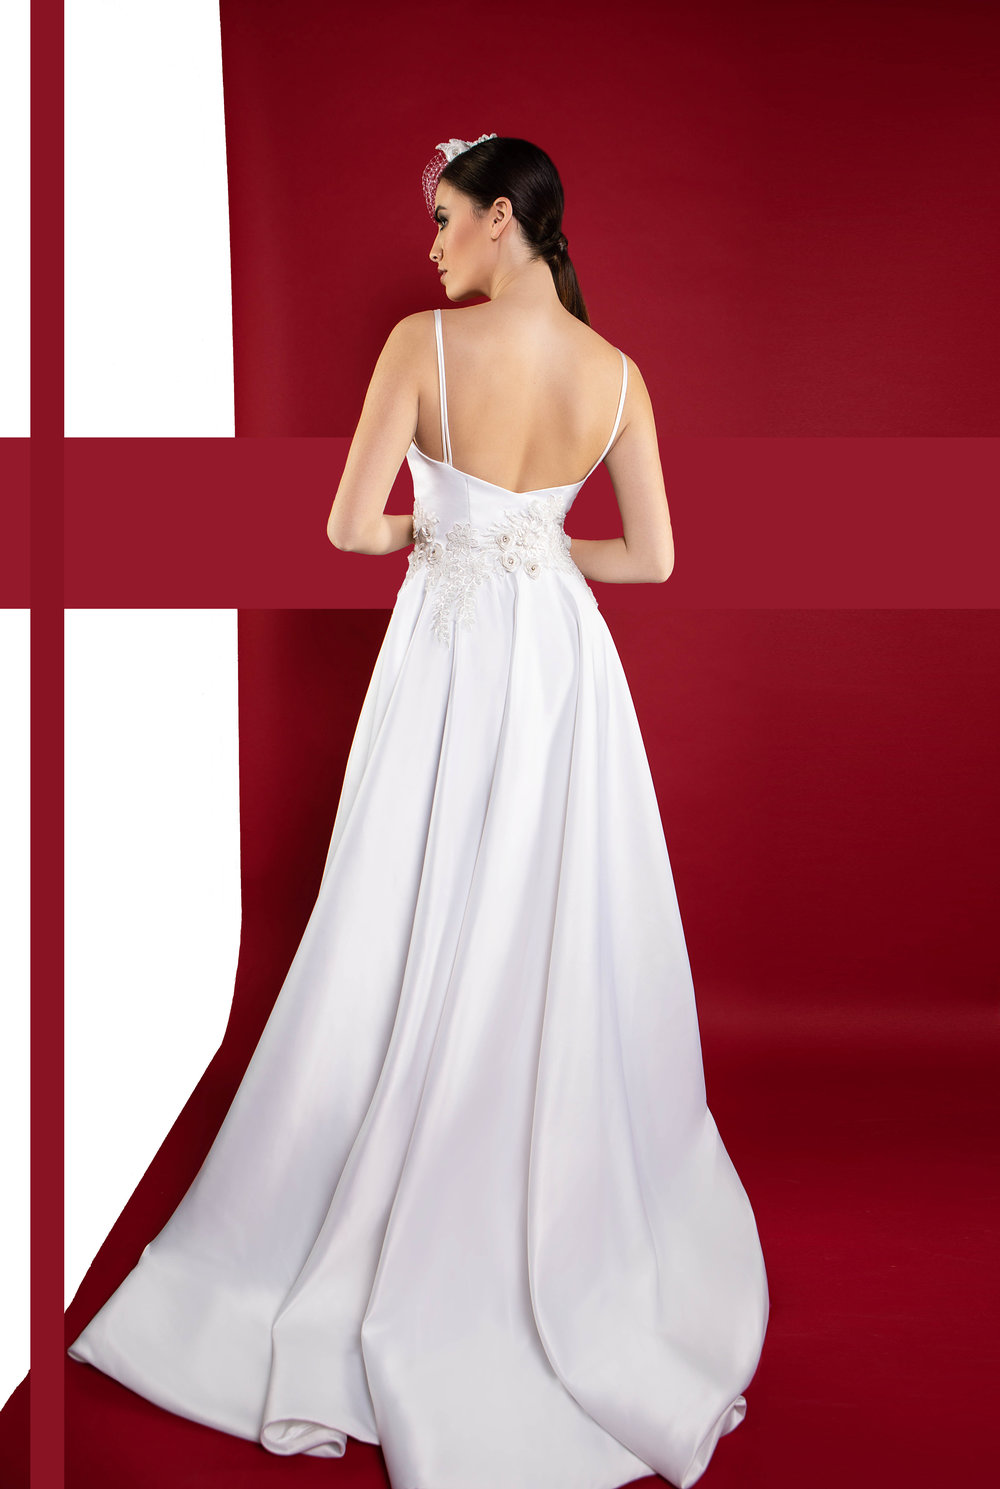 ball_gown_wedding_dress_back_view_tabitha_fielteau